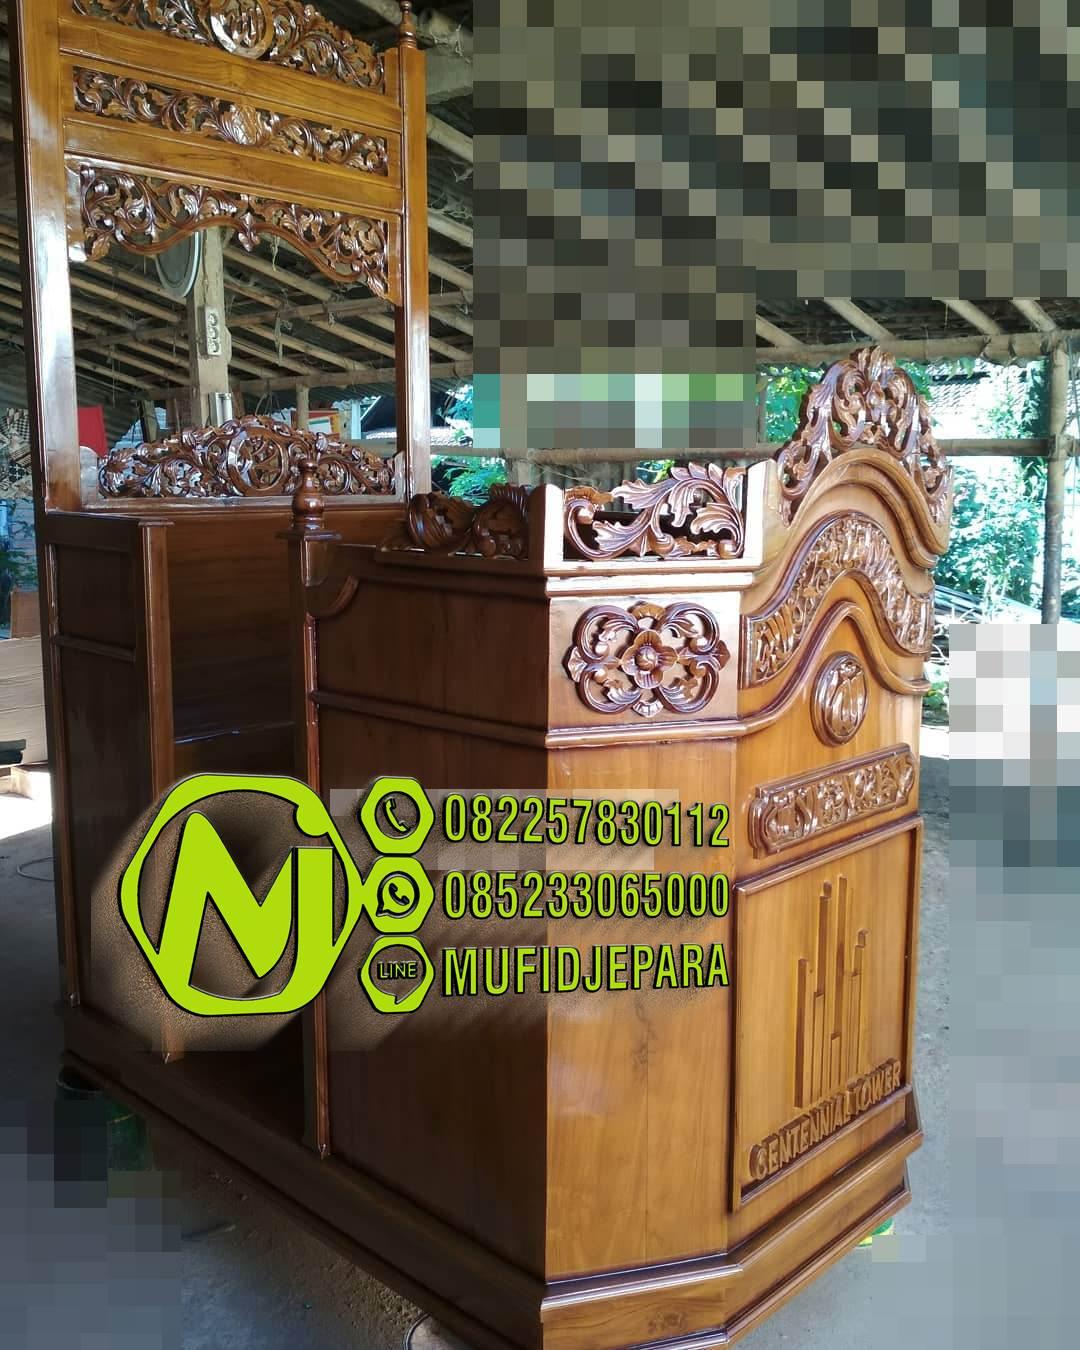 Mimbar Podium Masjid Ukuran Kecil Klasik Kayu Jati